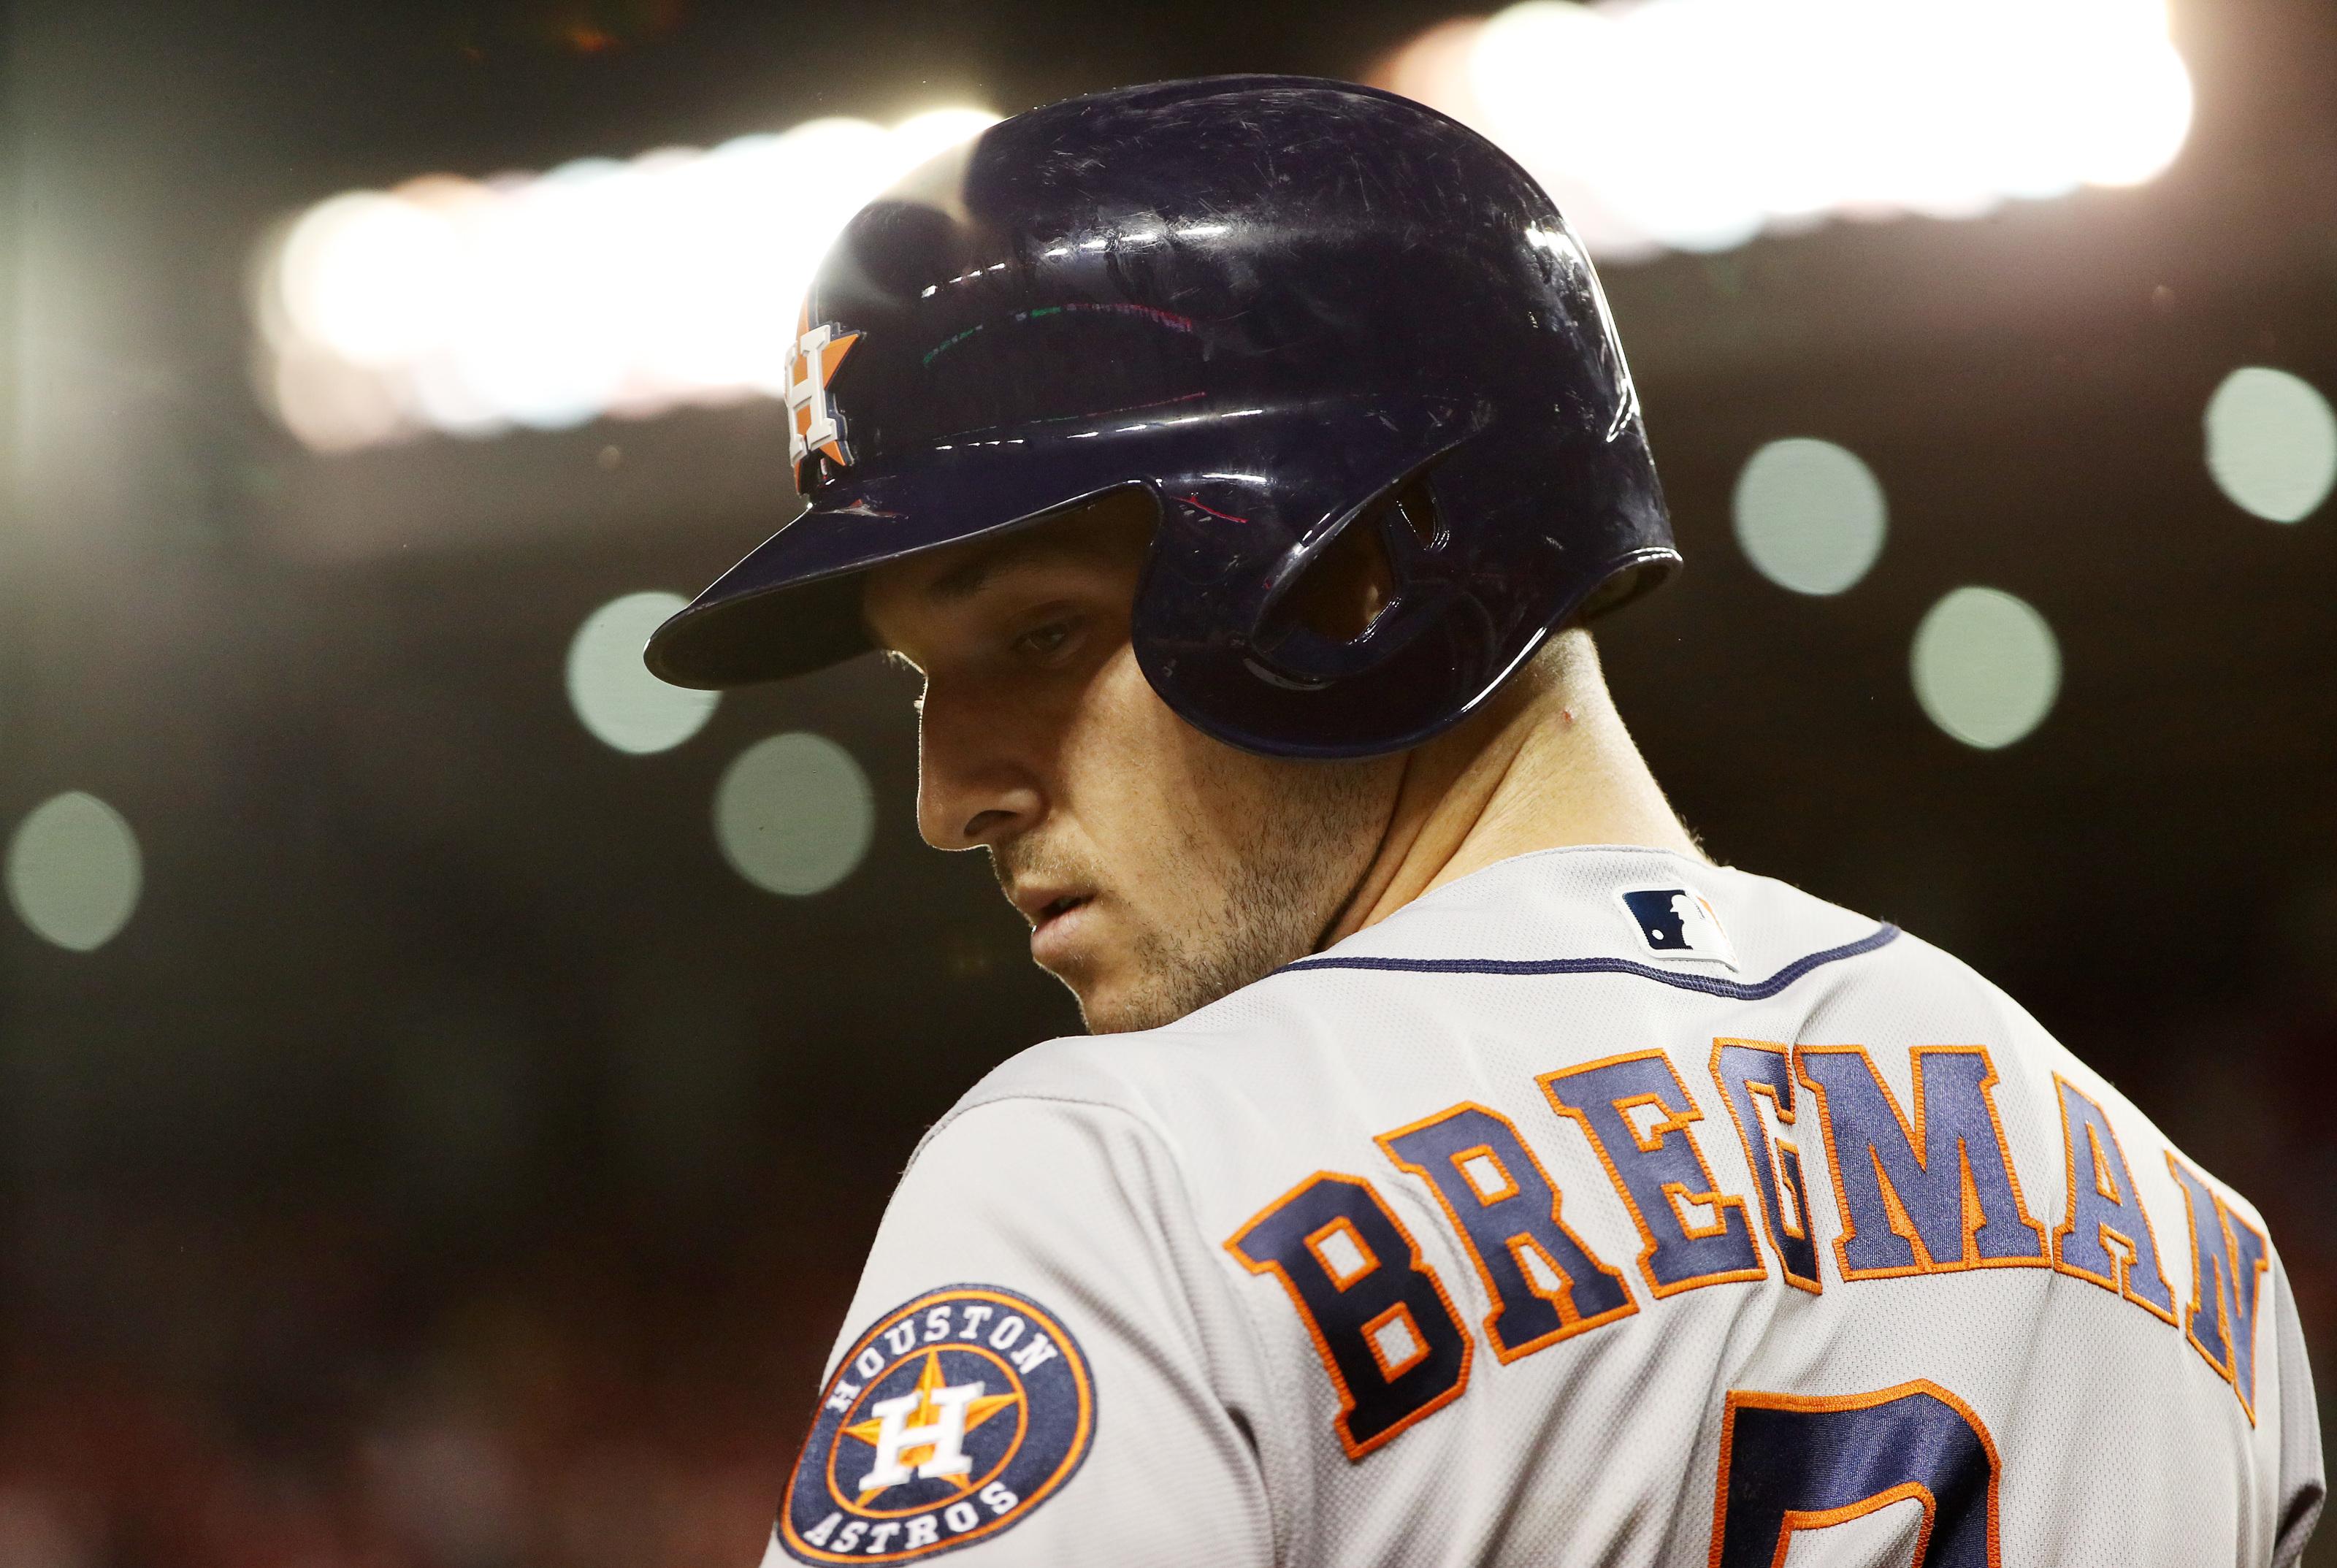 Alex Bregman Houston Astros Spring Training Baseball Player Jersey